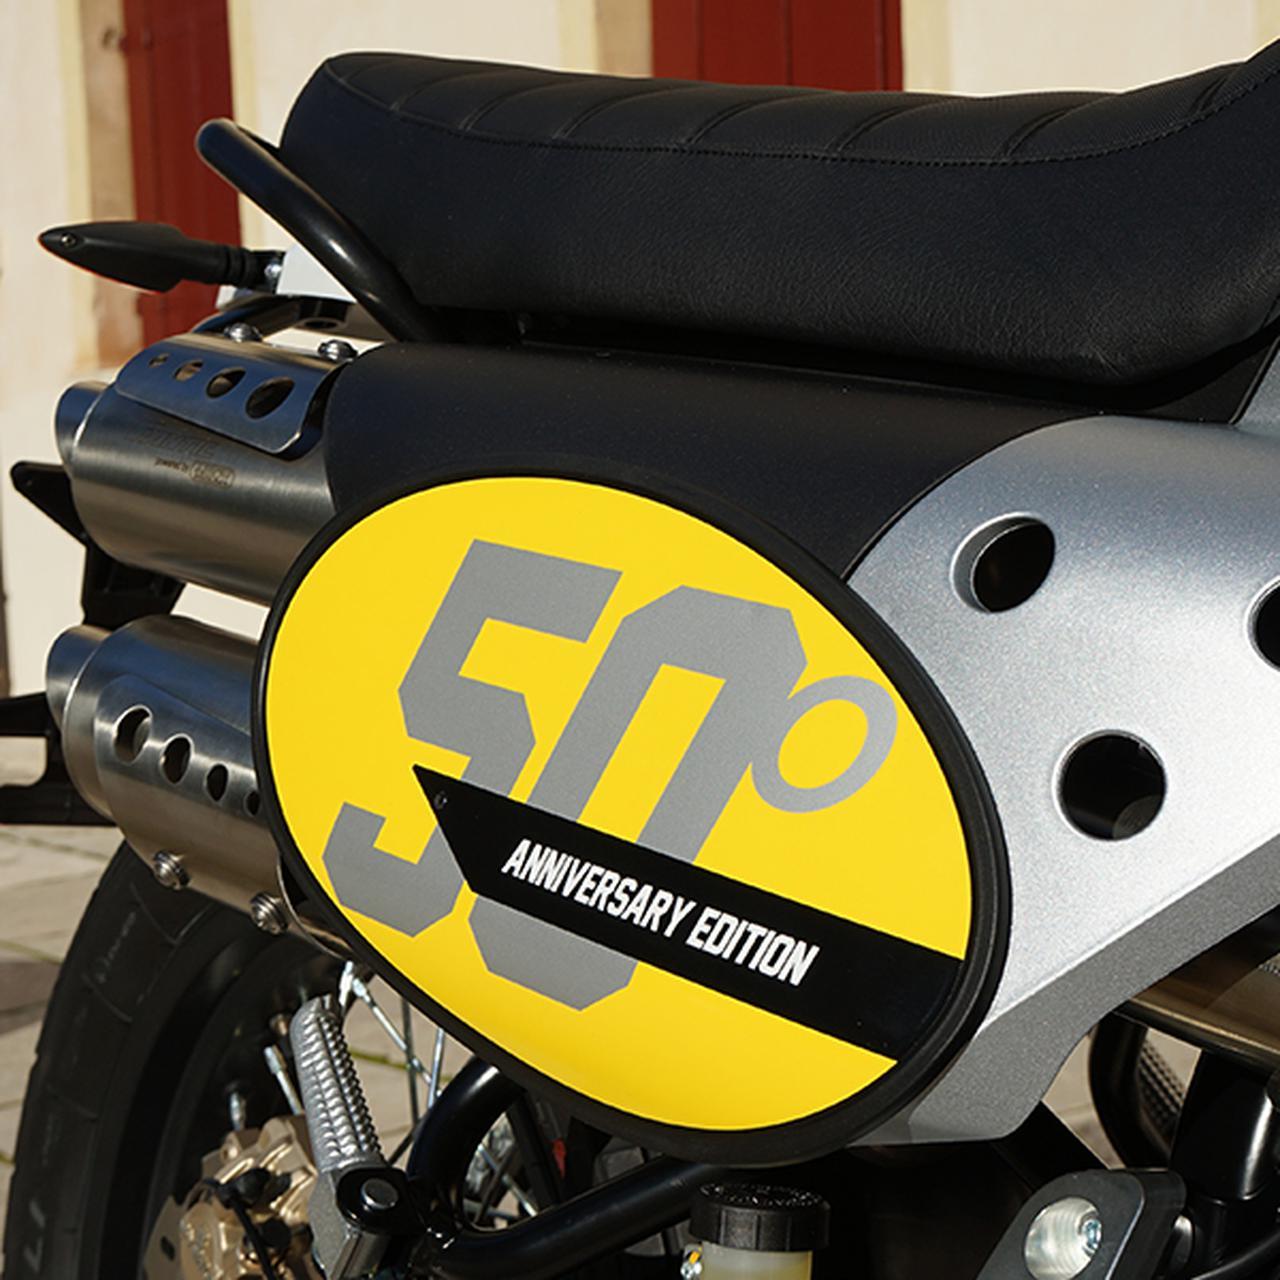 Images : 2番目の画像 - FANTIC「CABALLERO SCRAMBLER 500 ANNIVERSARY」の写真をもっと見る - webオートバイ